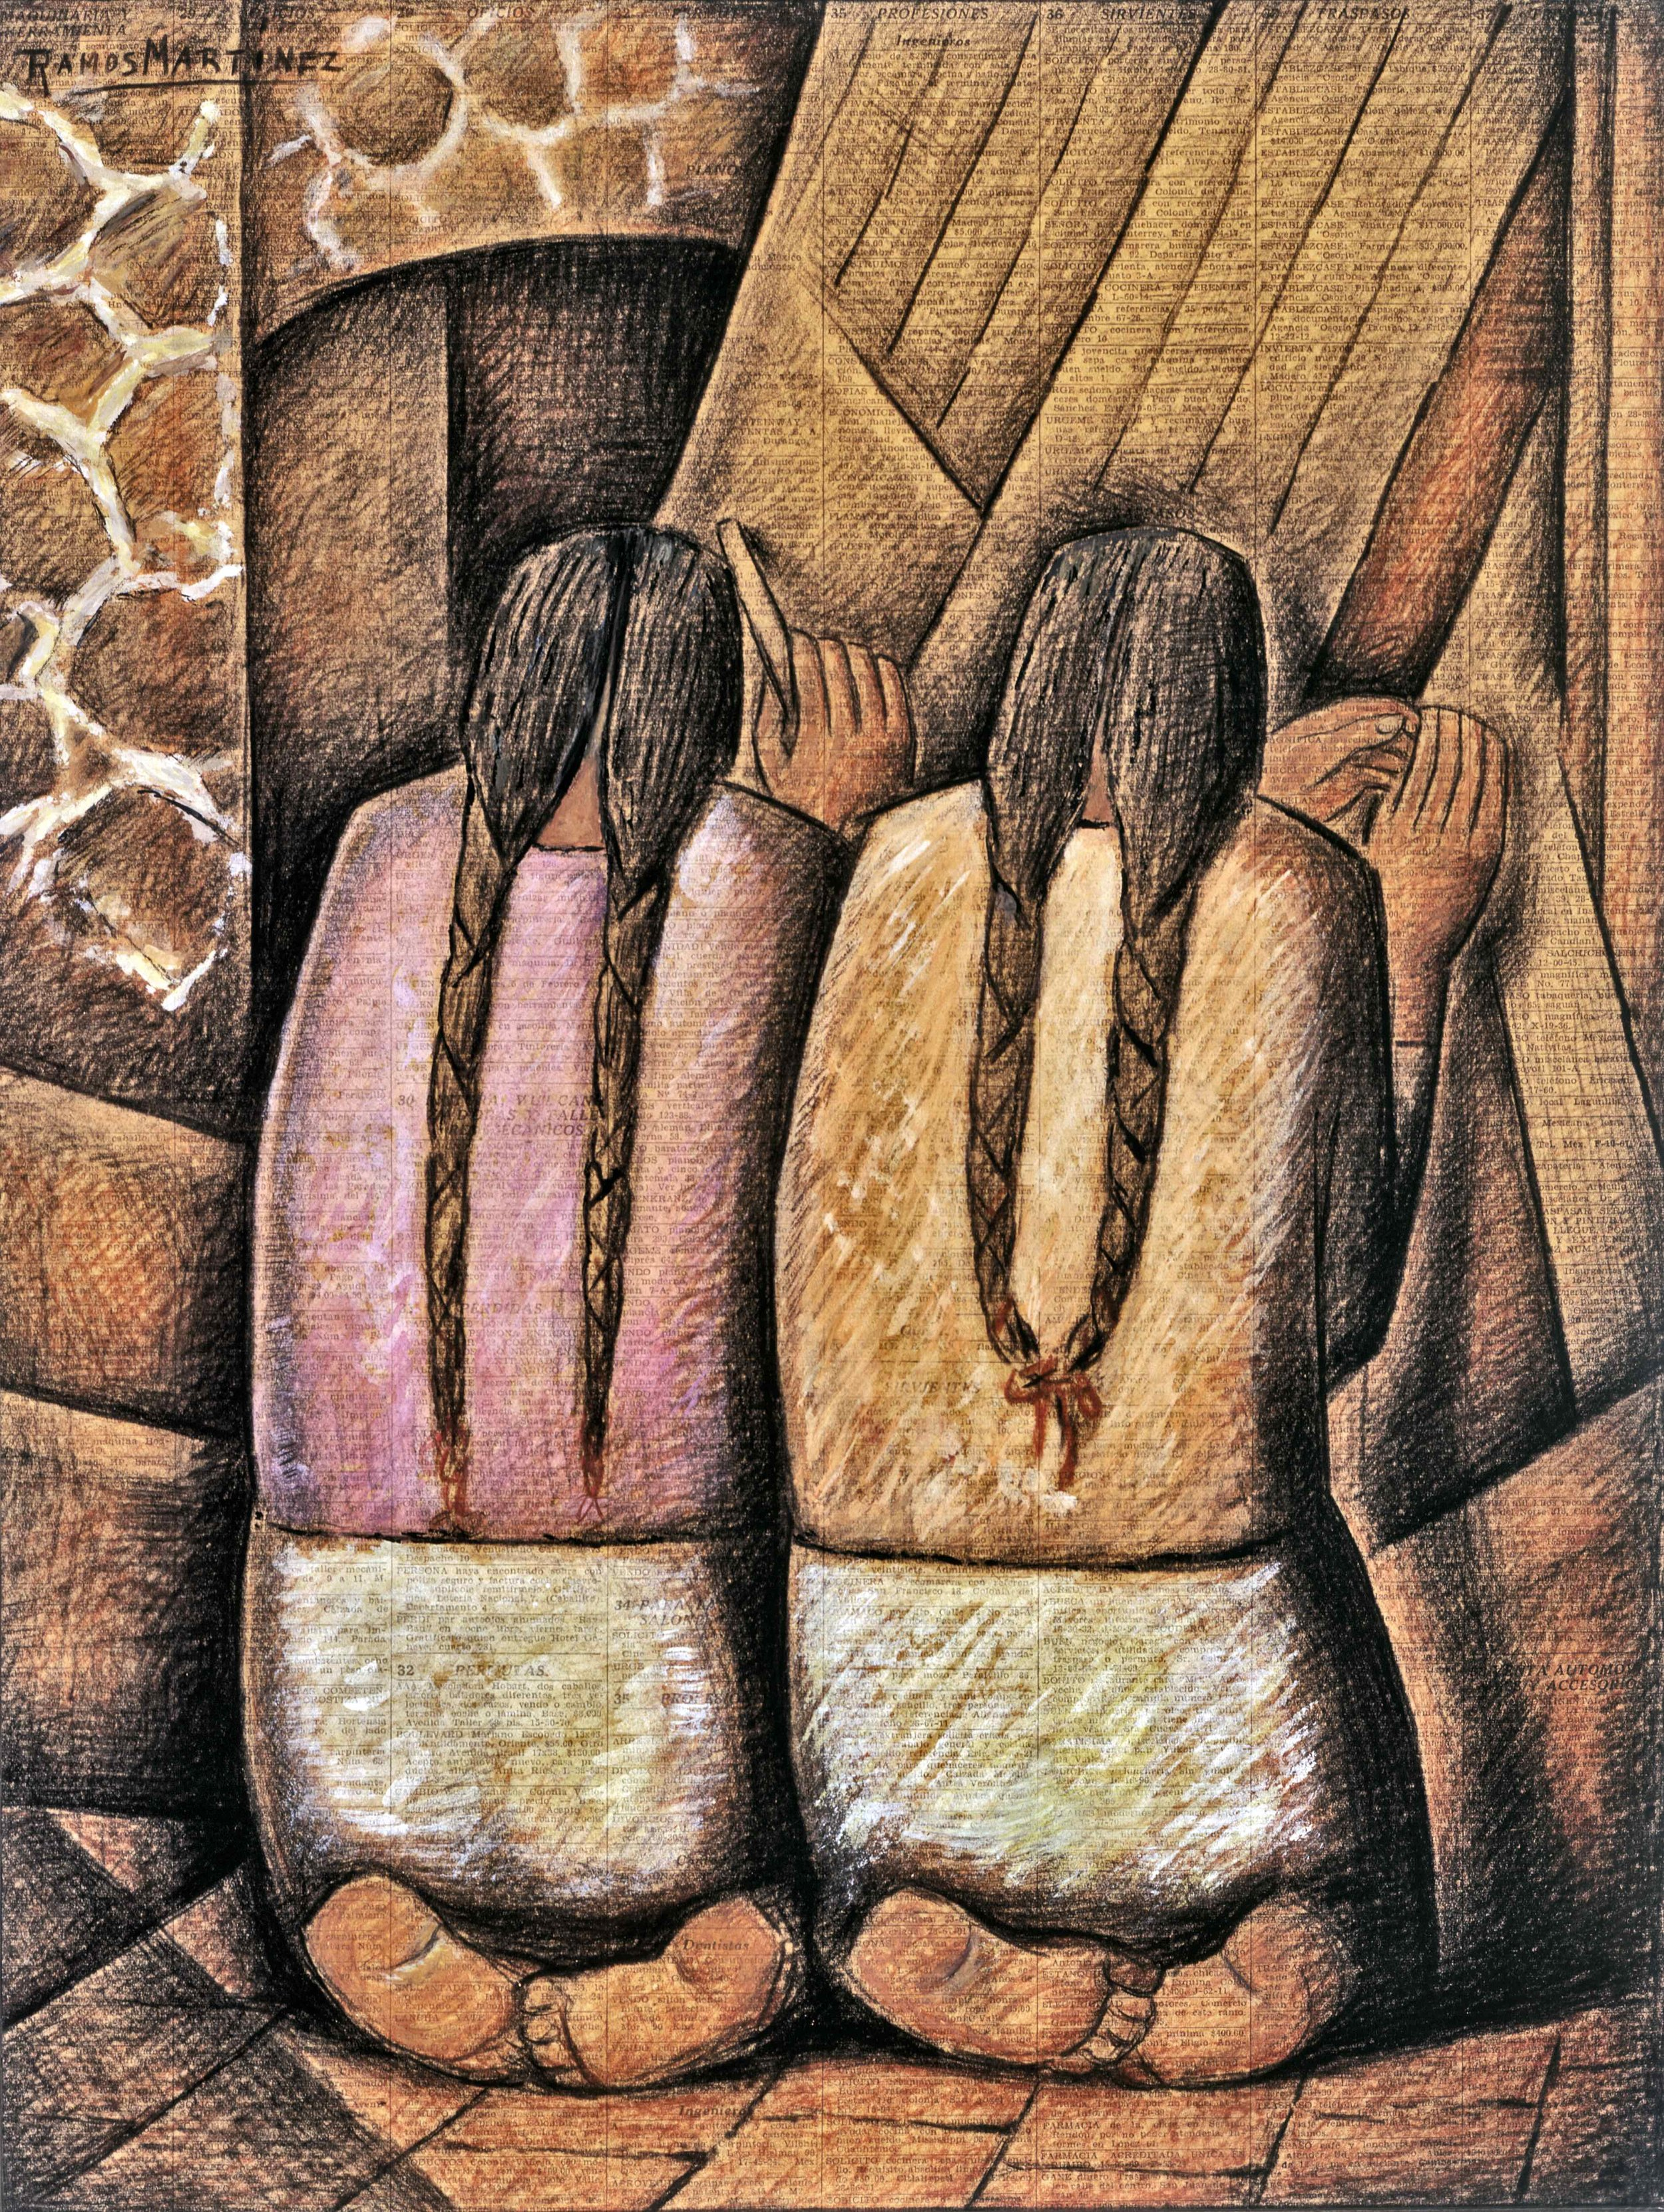 Las Tejedoras / The Weavers  1944 tempera and charcoal on newsprint / temple y carbón sobre papel periódico (El Universal, September 3, 1944) 21 x 16 inches; 53.3 x 40.6 centímetros University of Arizona Museum of Art